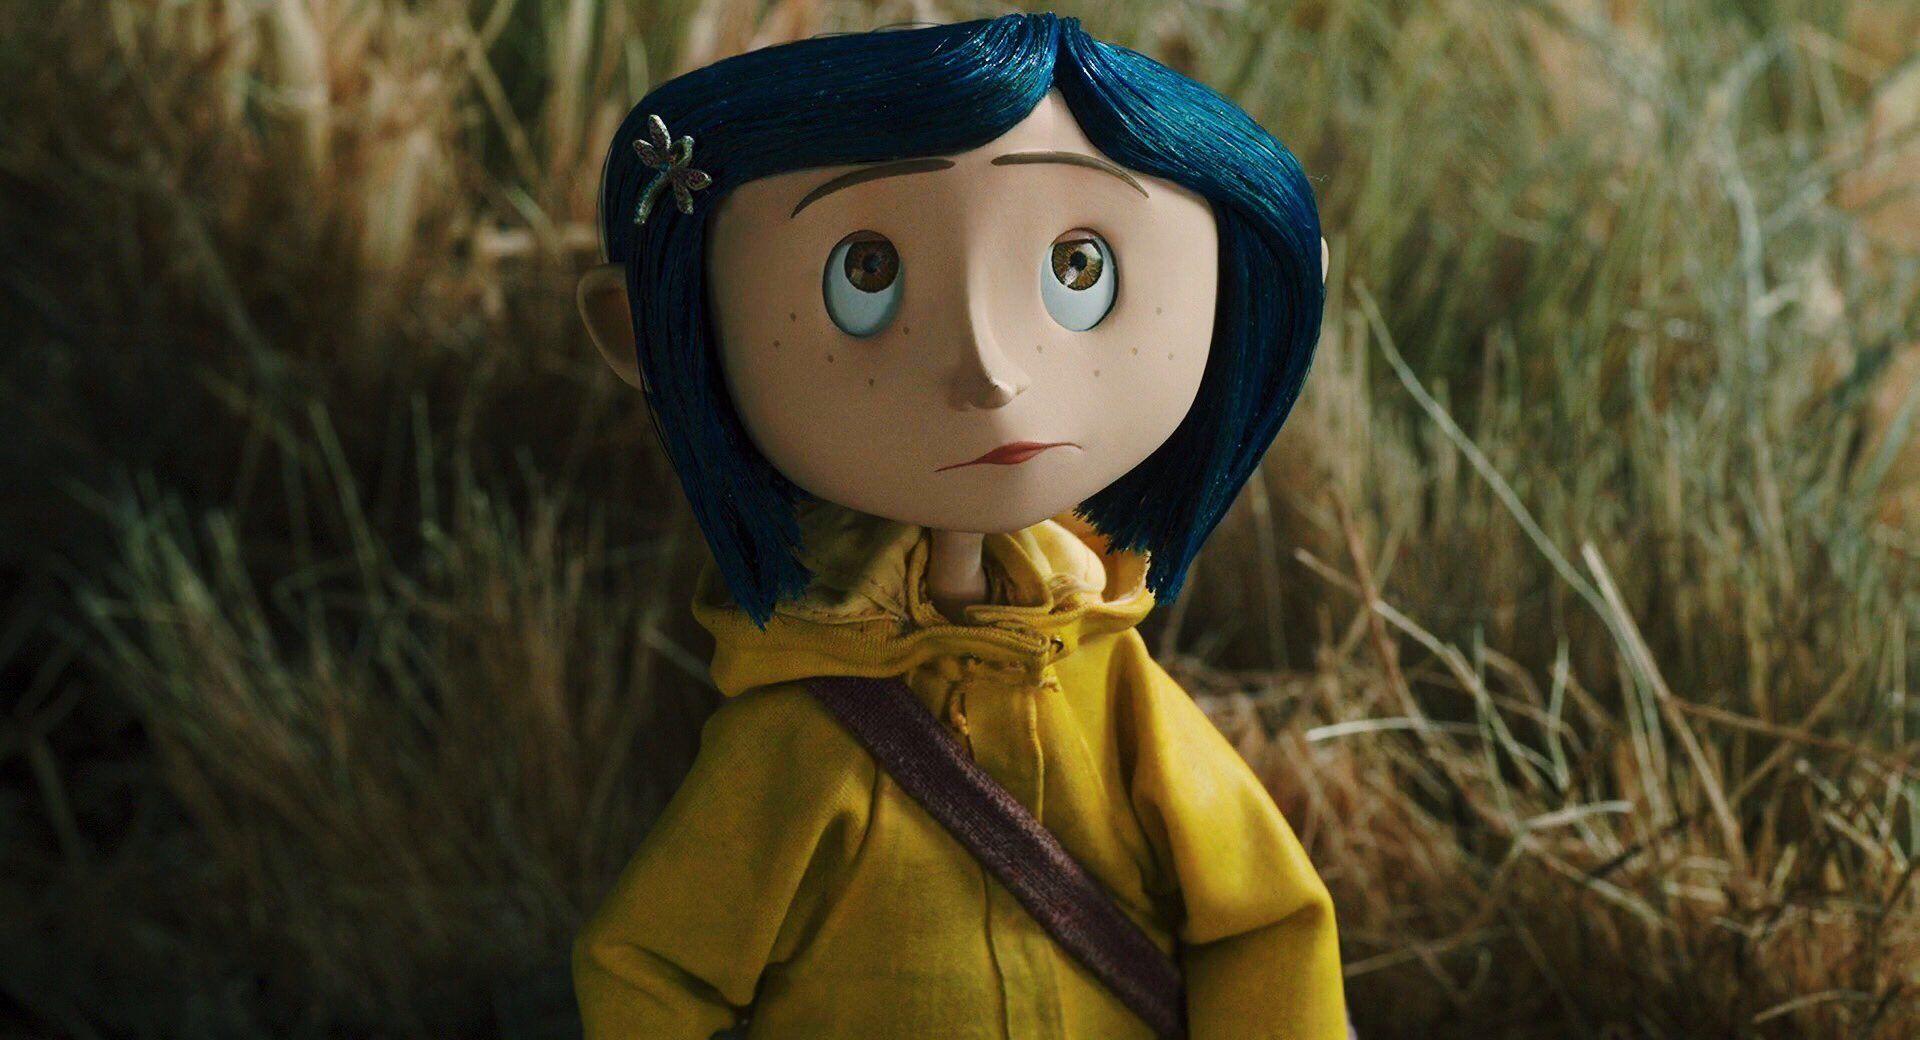 mio on Twitter | Coraline movie, Coraline jones, Coraline